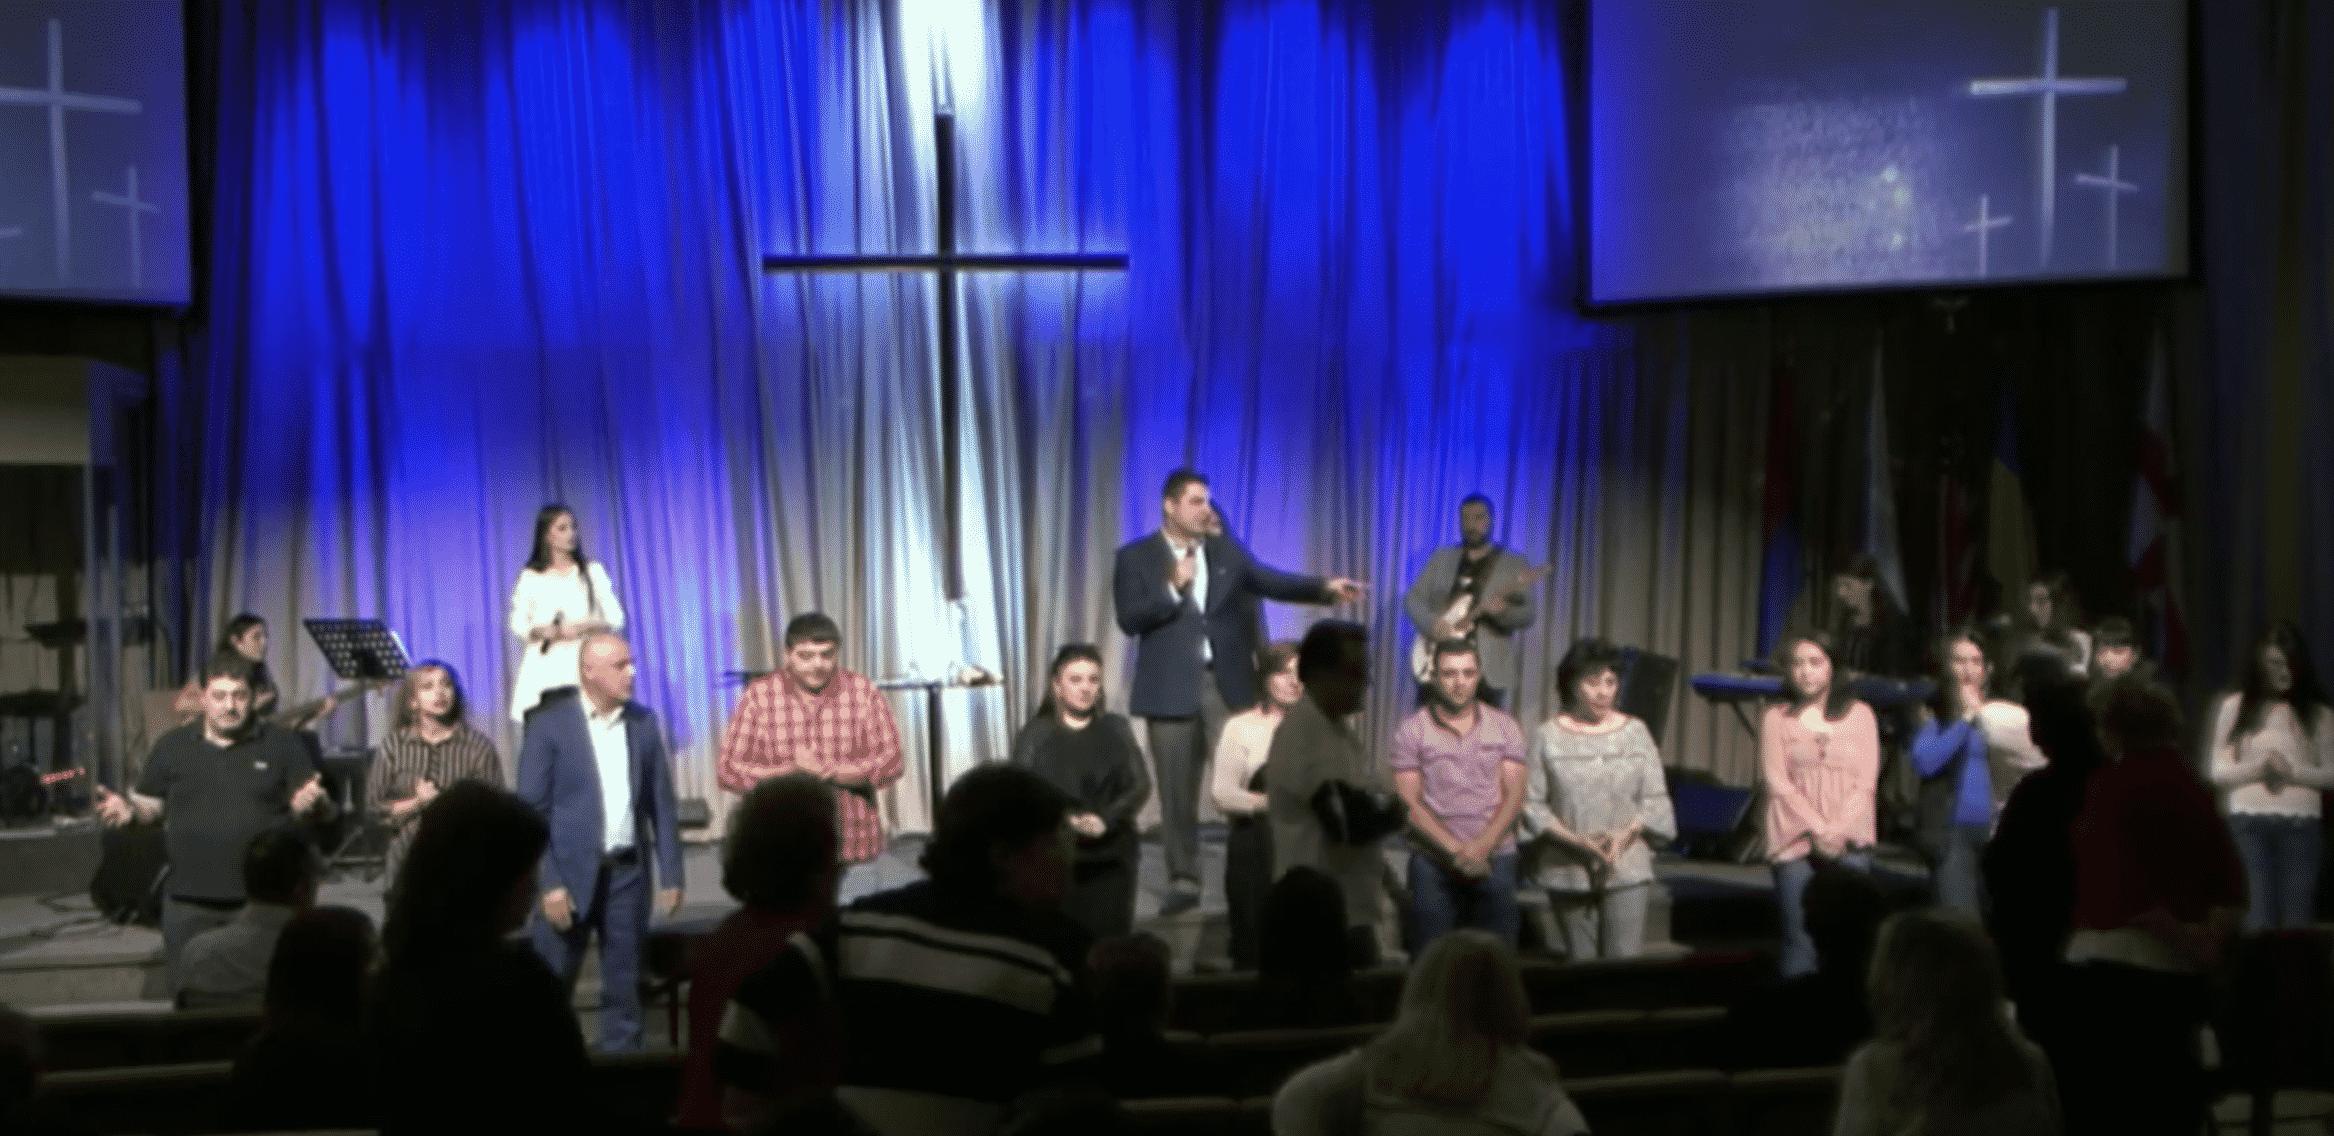 Sunday Service - Feb 11, 2018